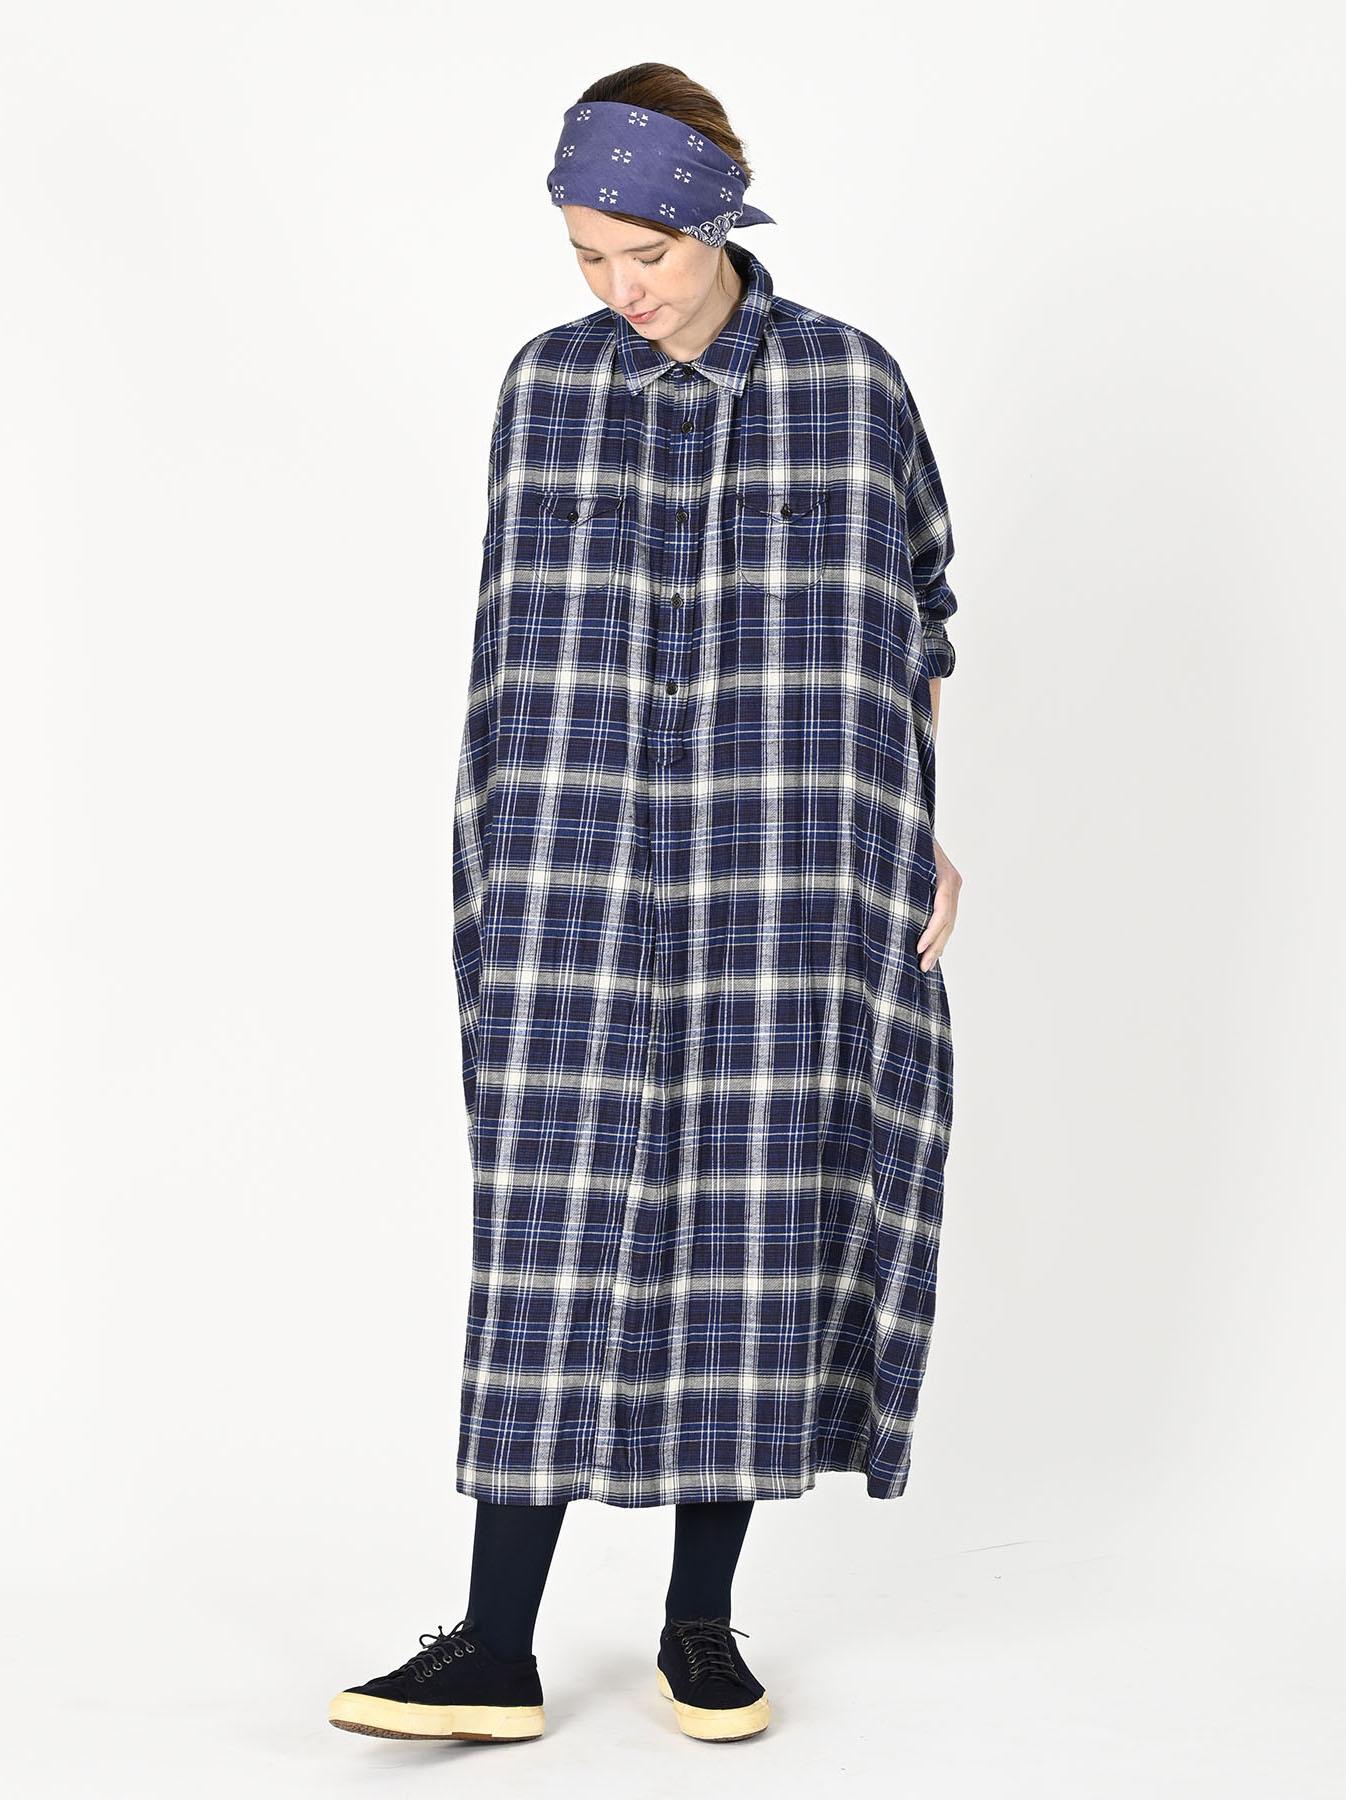 Indigo Twill Double Cloth Shirt Dress-2